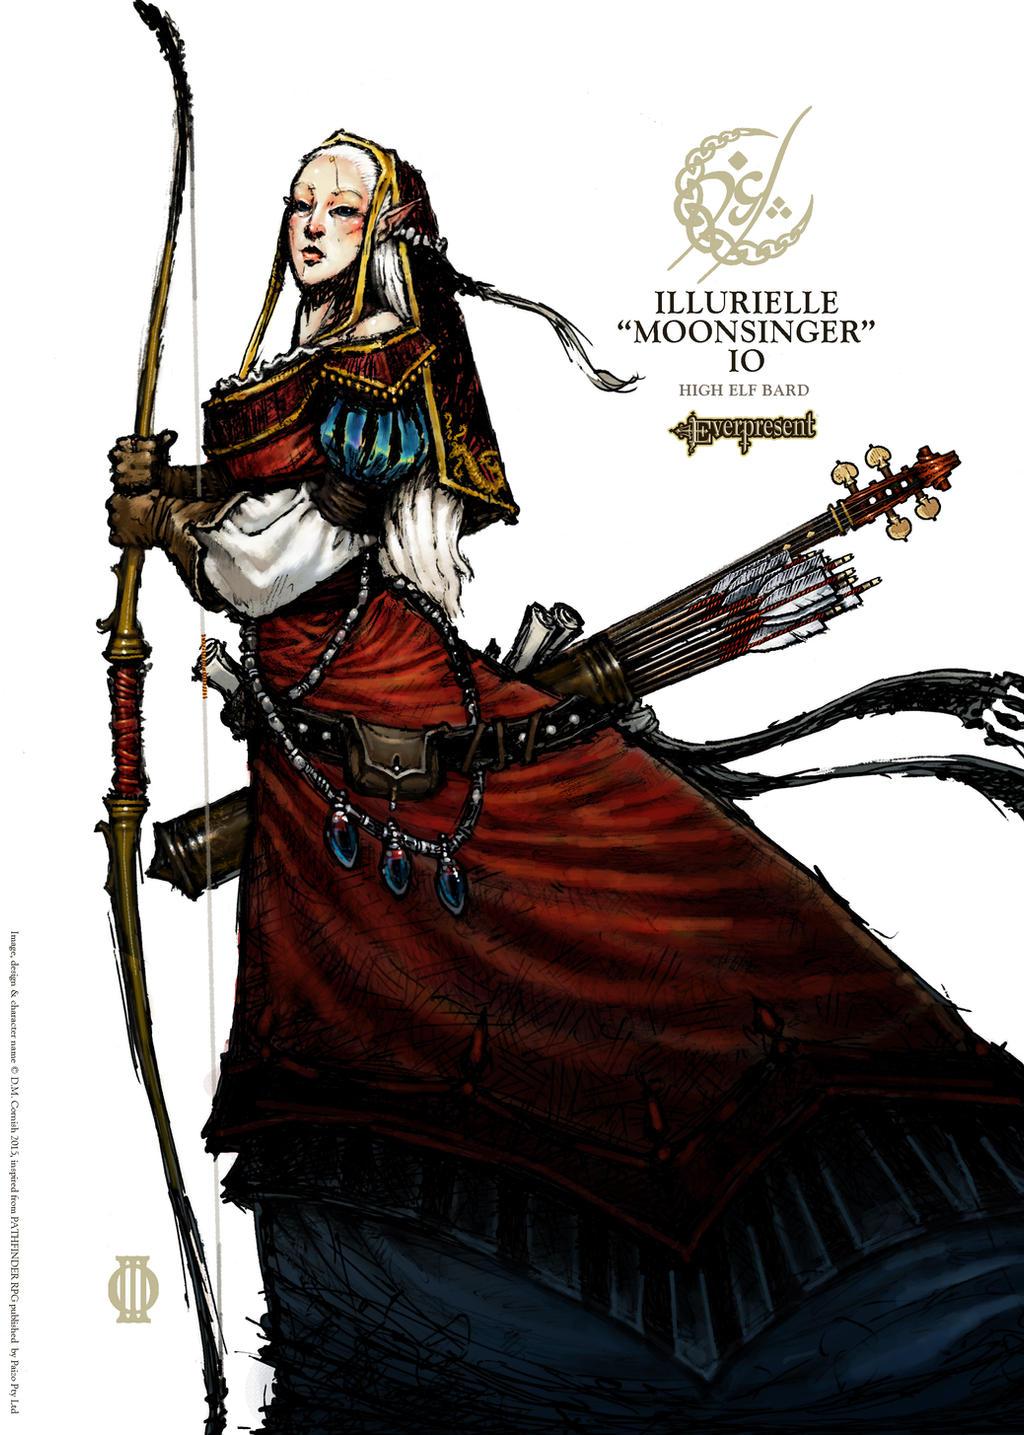 Pathfinder - Illurielle Moonsinger, elven bard by Fouracres